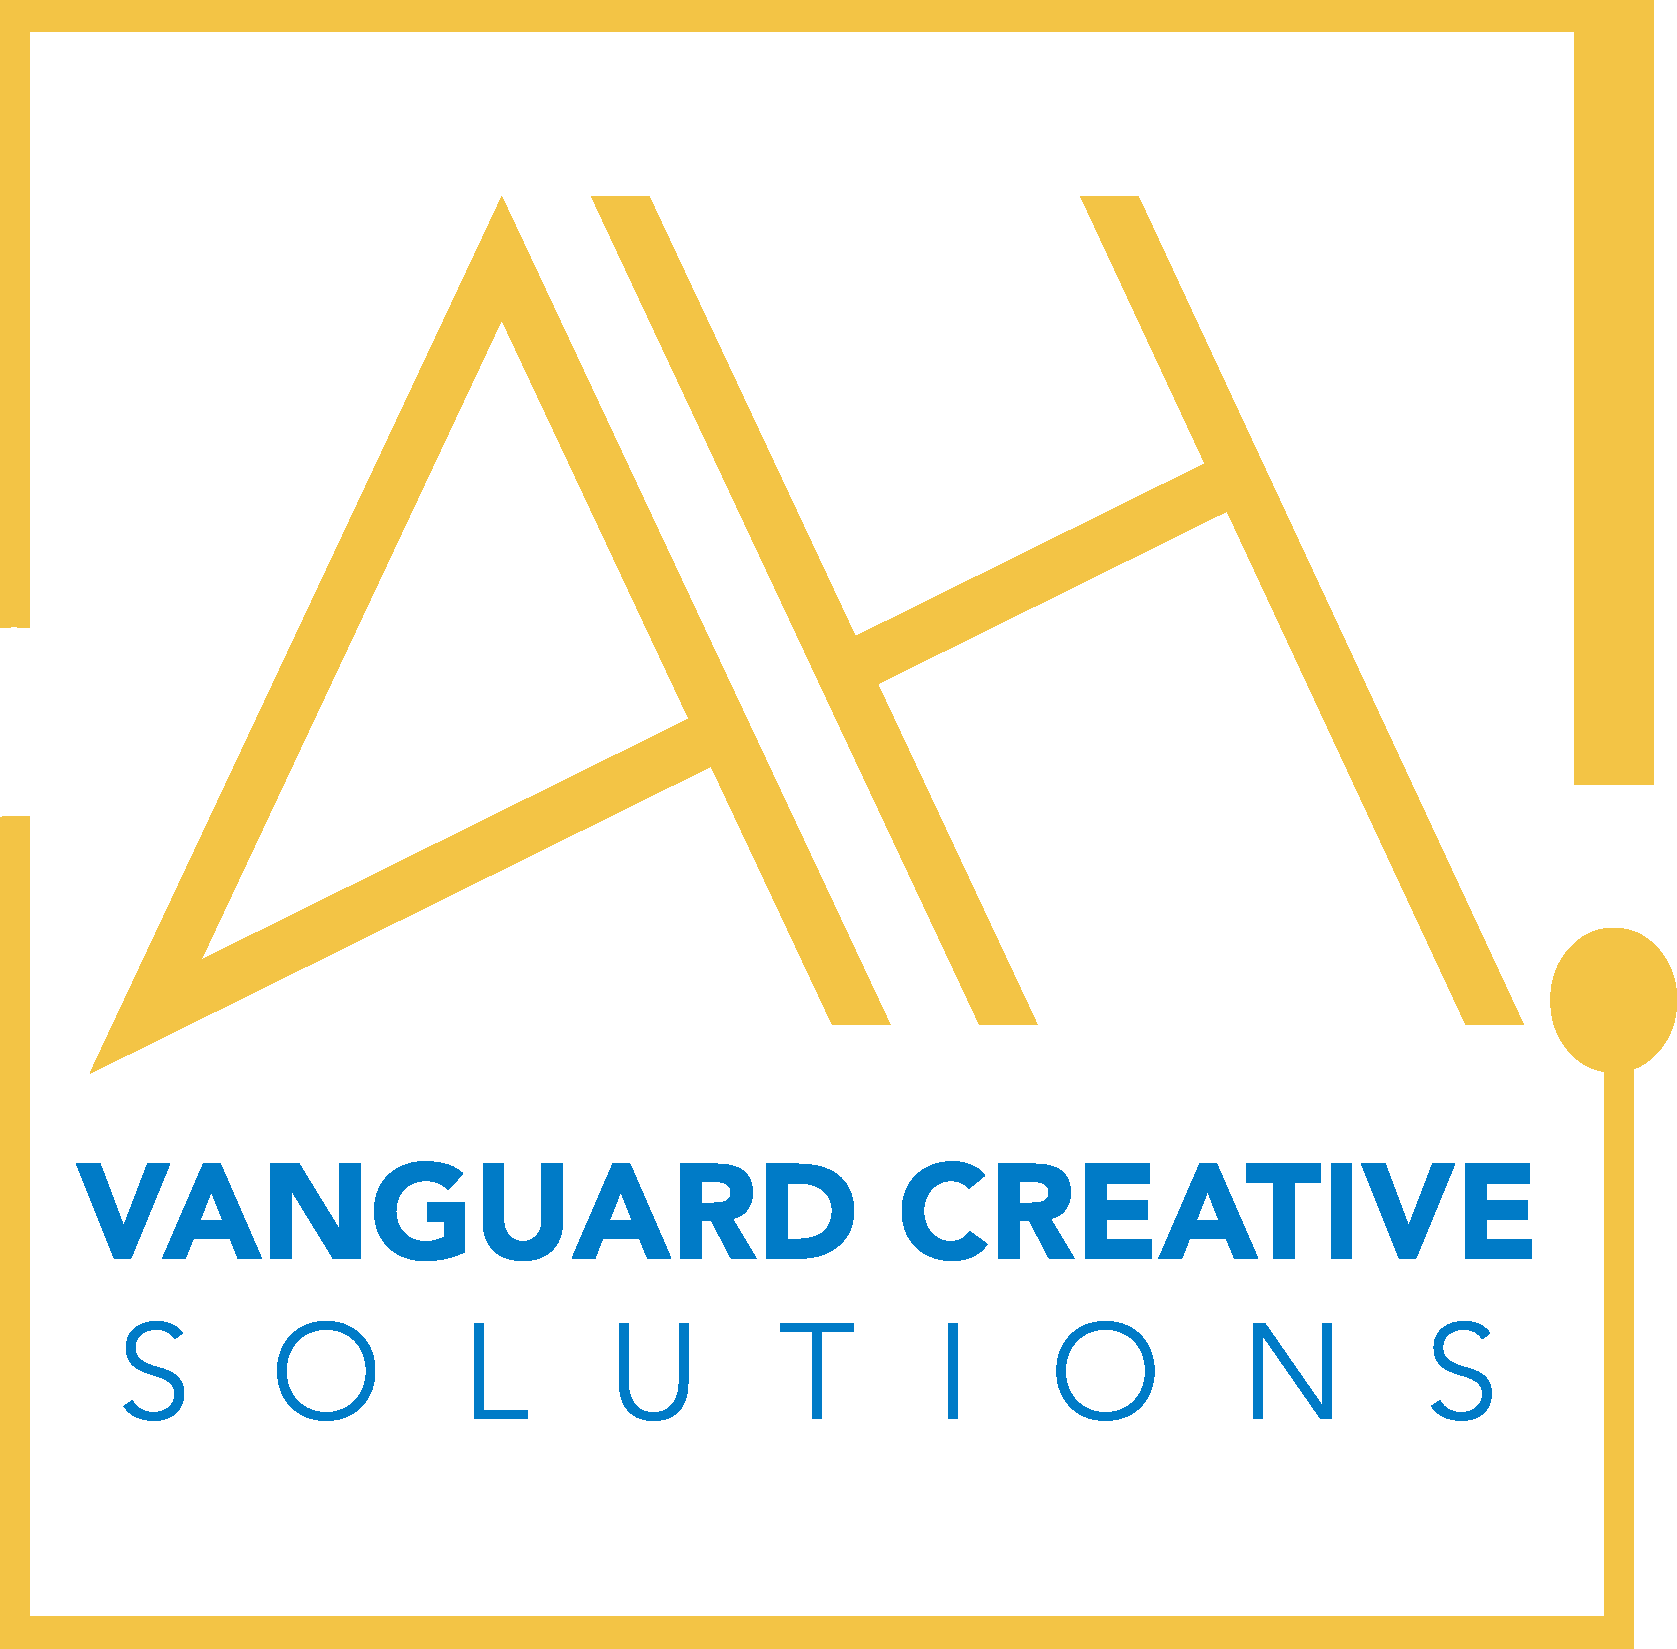 ahVanguard Creative Solutions